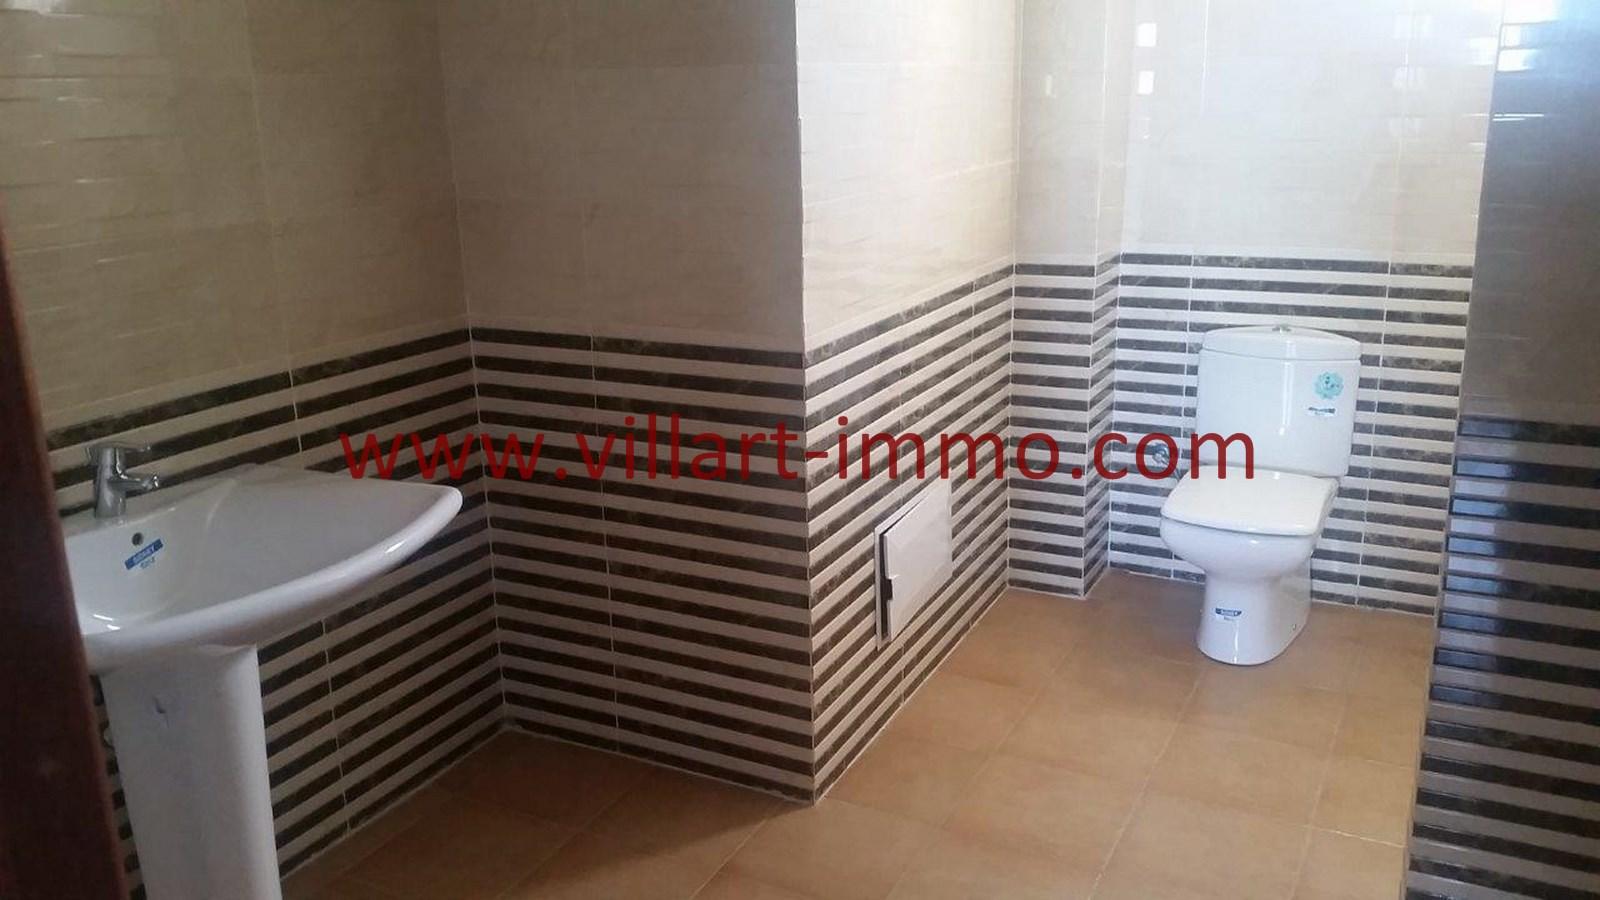 10-vente-appartement-region-tetouan-mdiq-salle-de-bain-2-va395-villart-immo